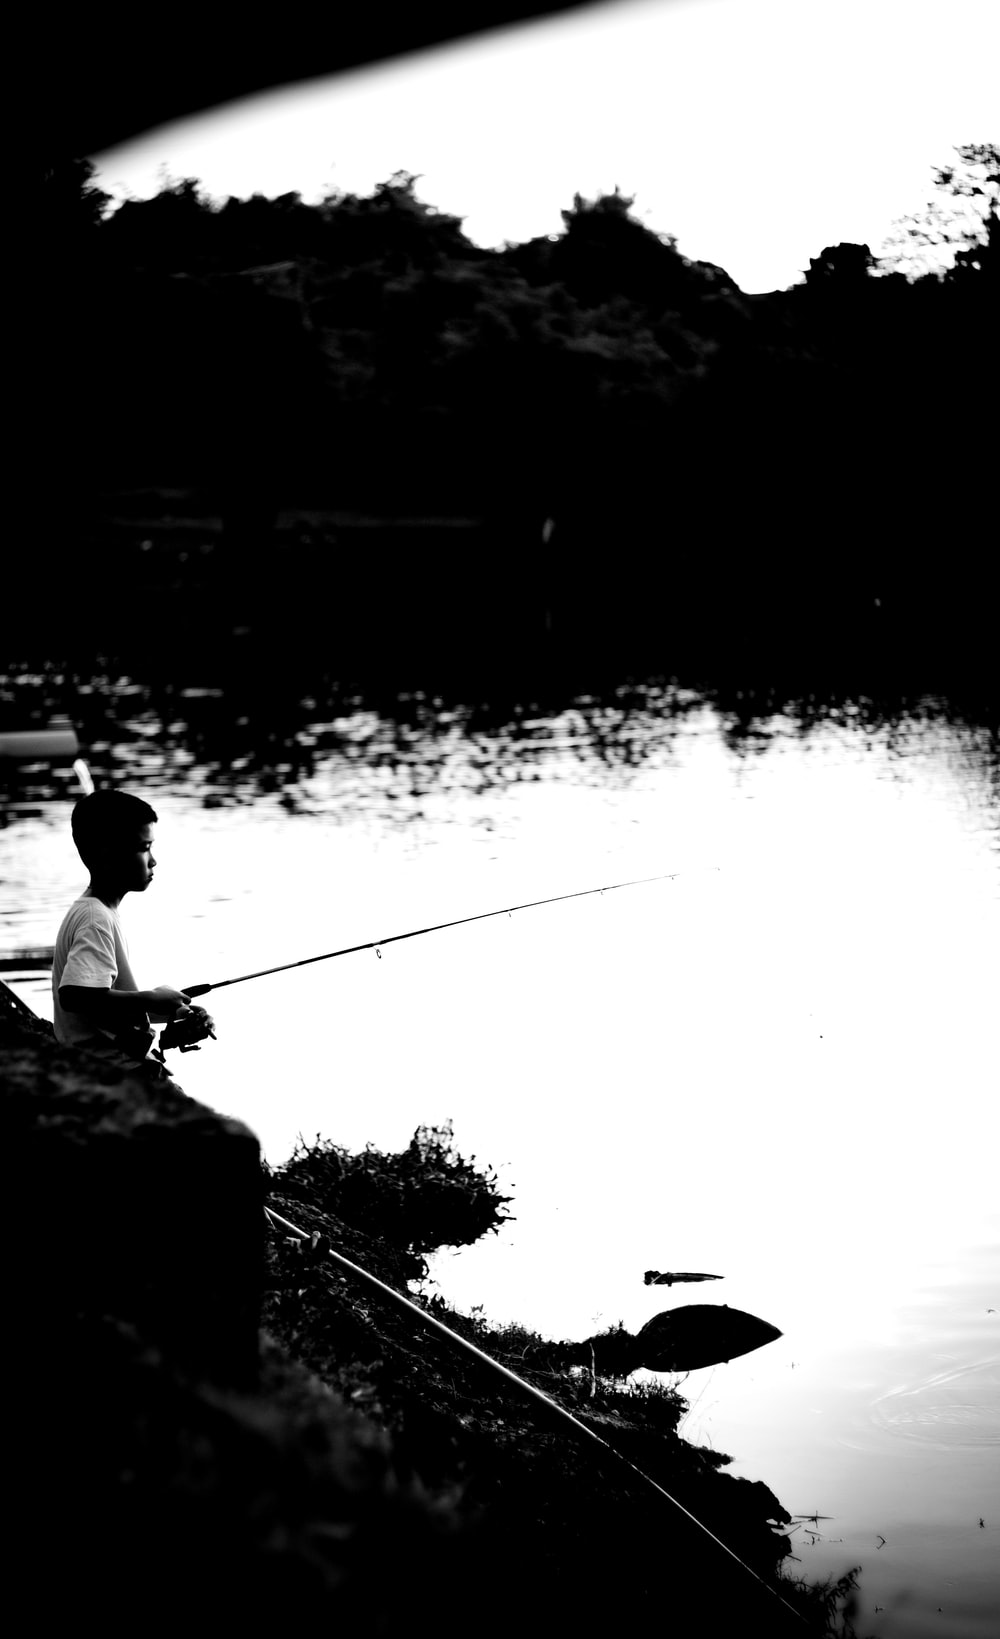 grayscale photography of boy fishing on lake